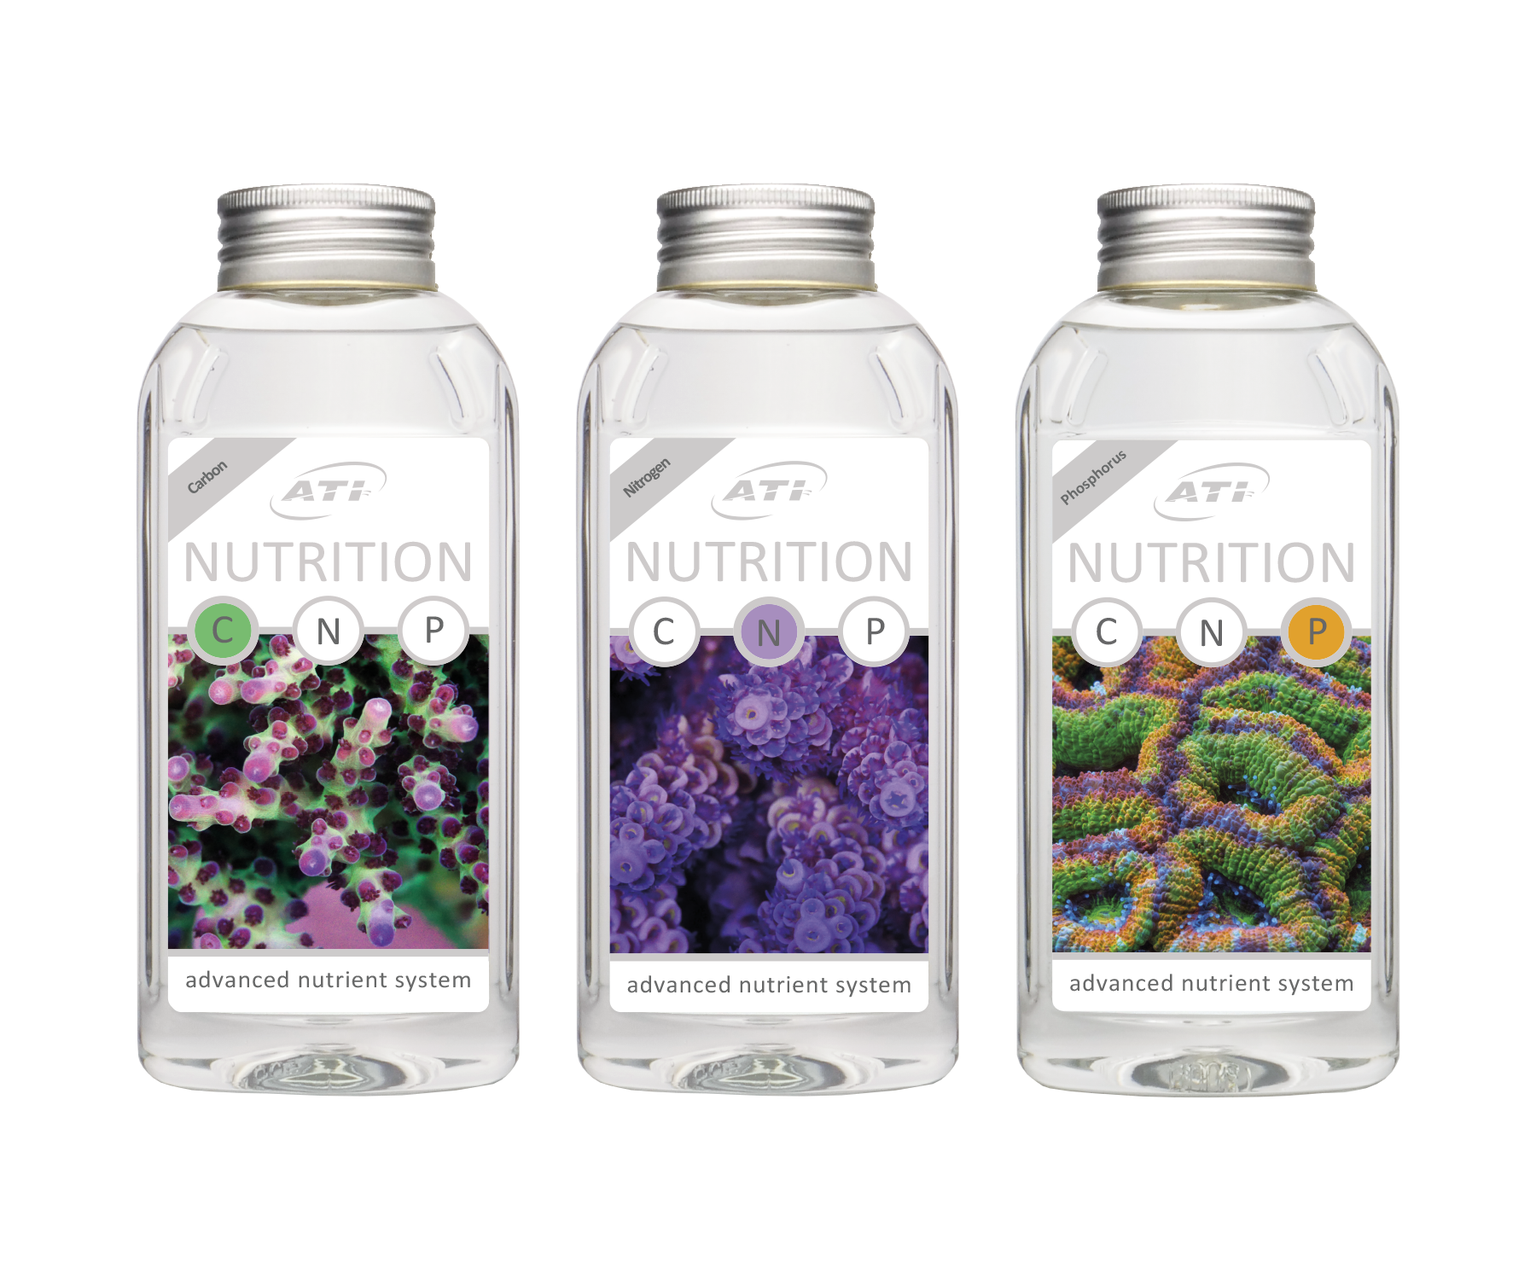 ATI Nutrition C - 500 ml